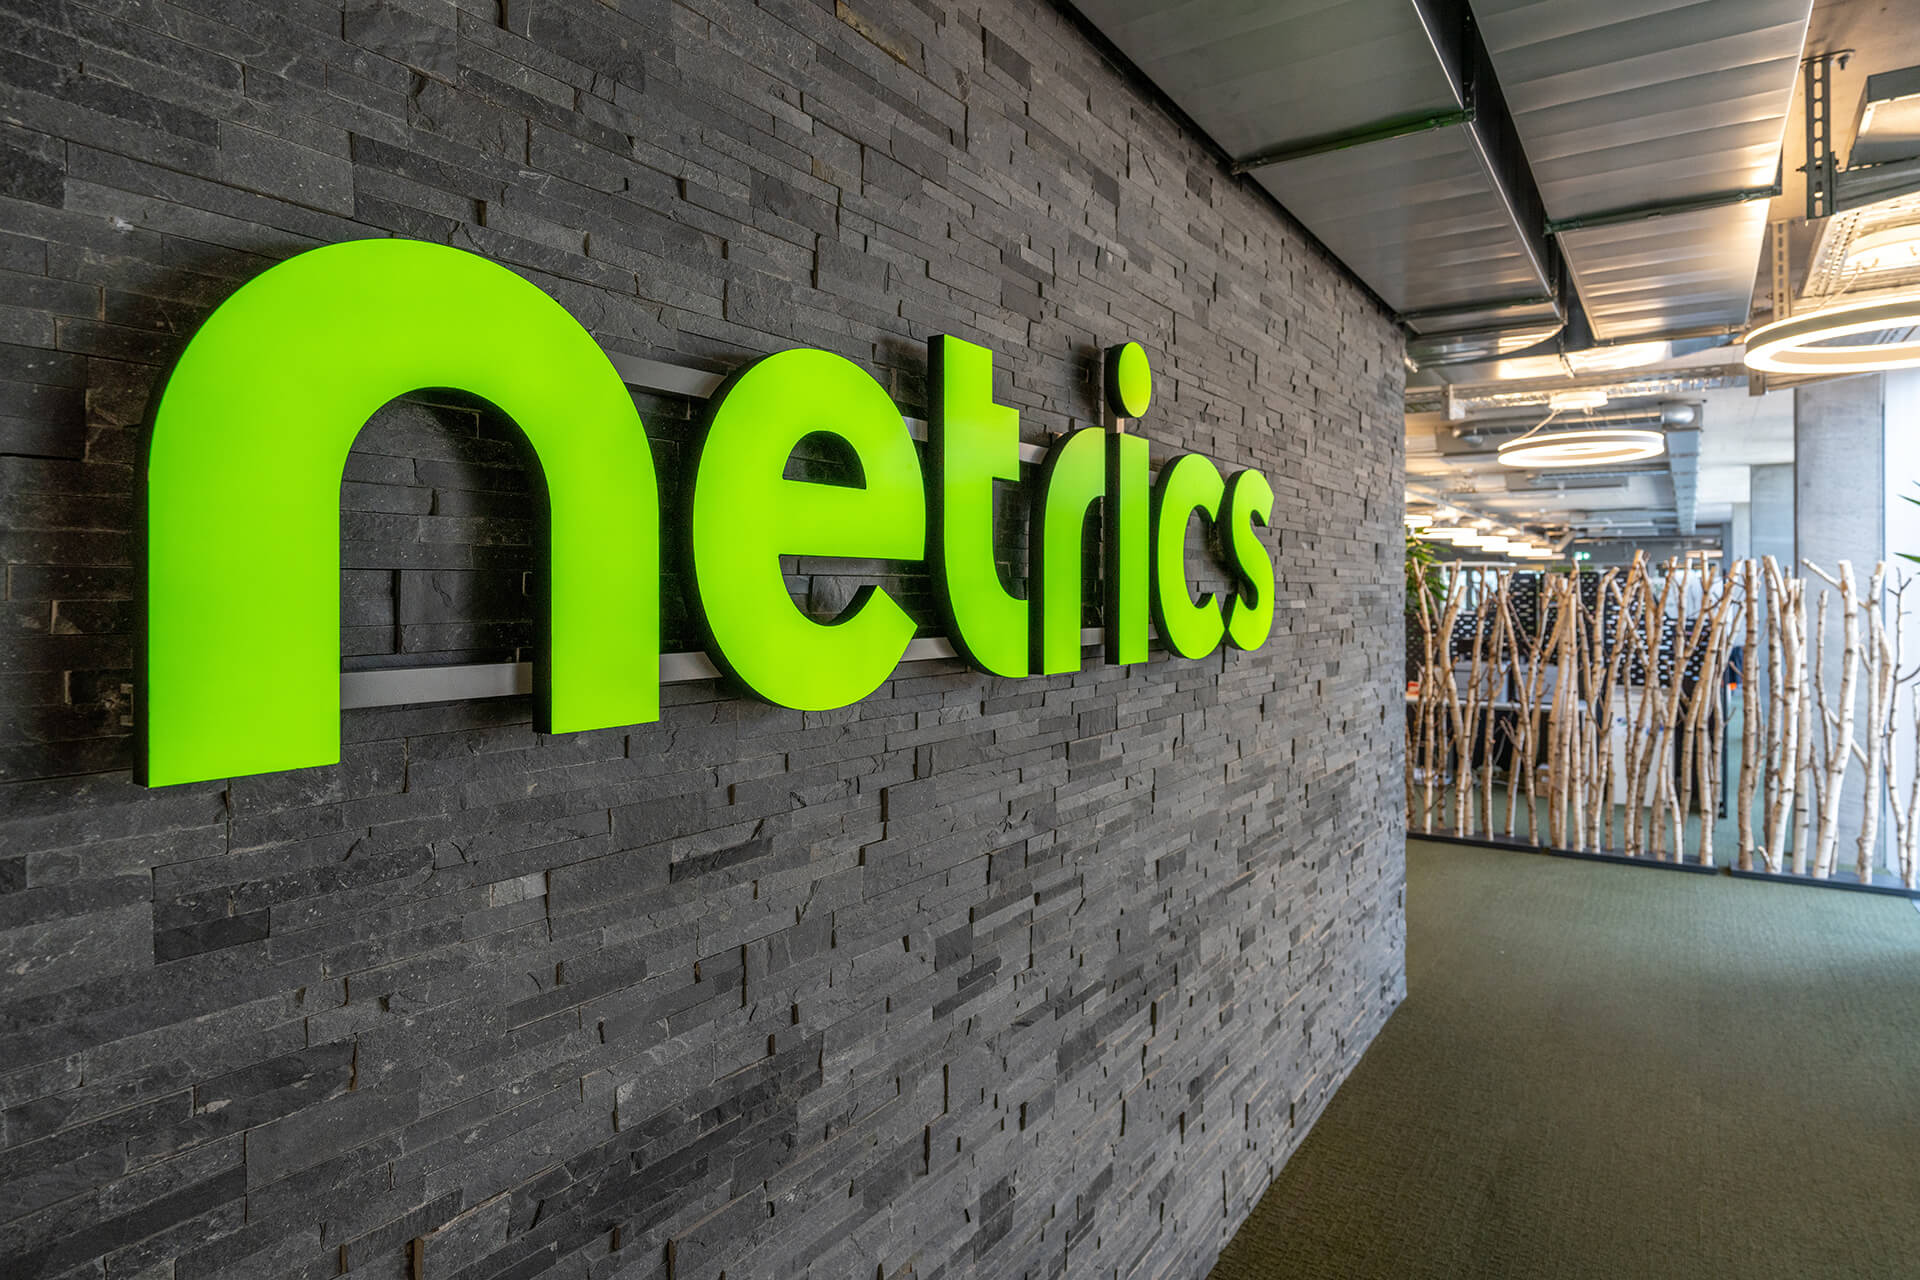 Netrics-DC-1604